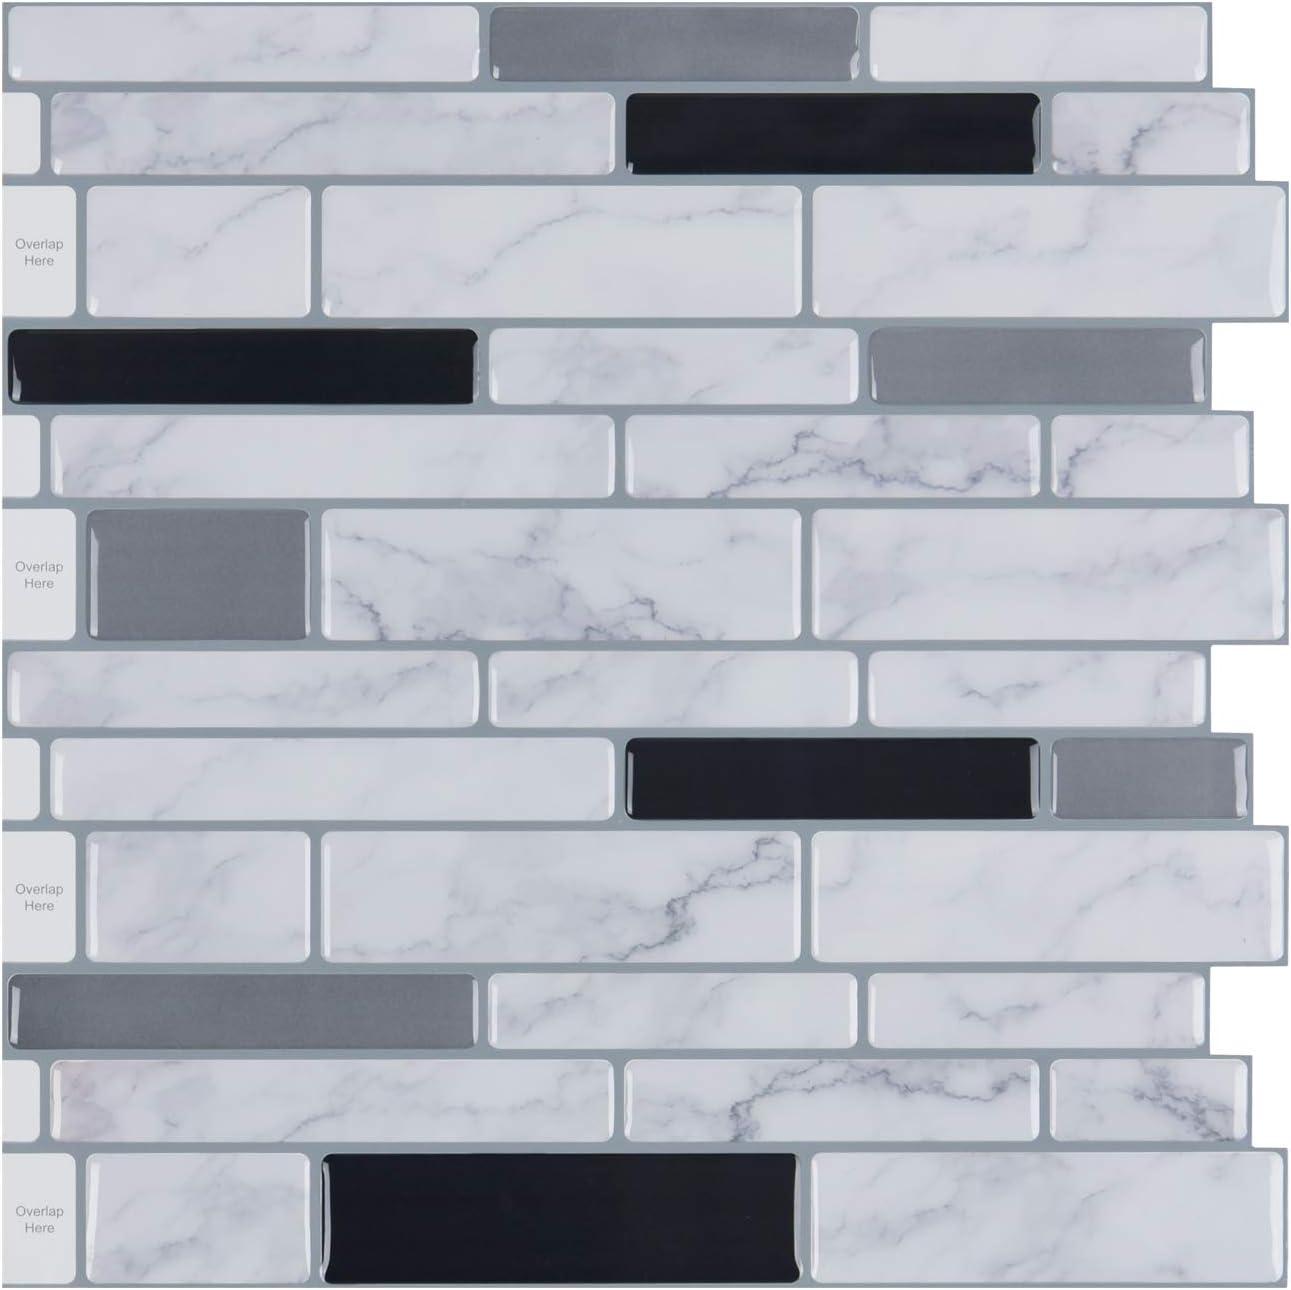 2M Self-Adhesive Side Line Tile Sticker Bathroom Kitchen Restaurant Wall St D3K6